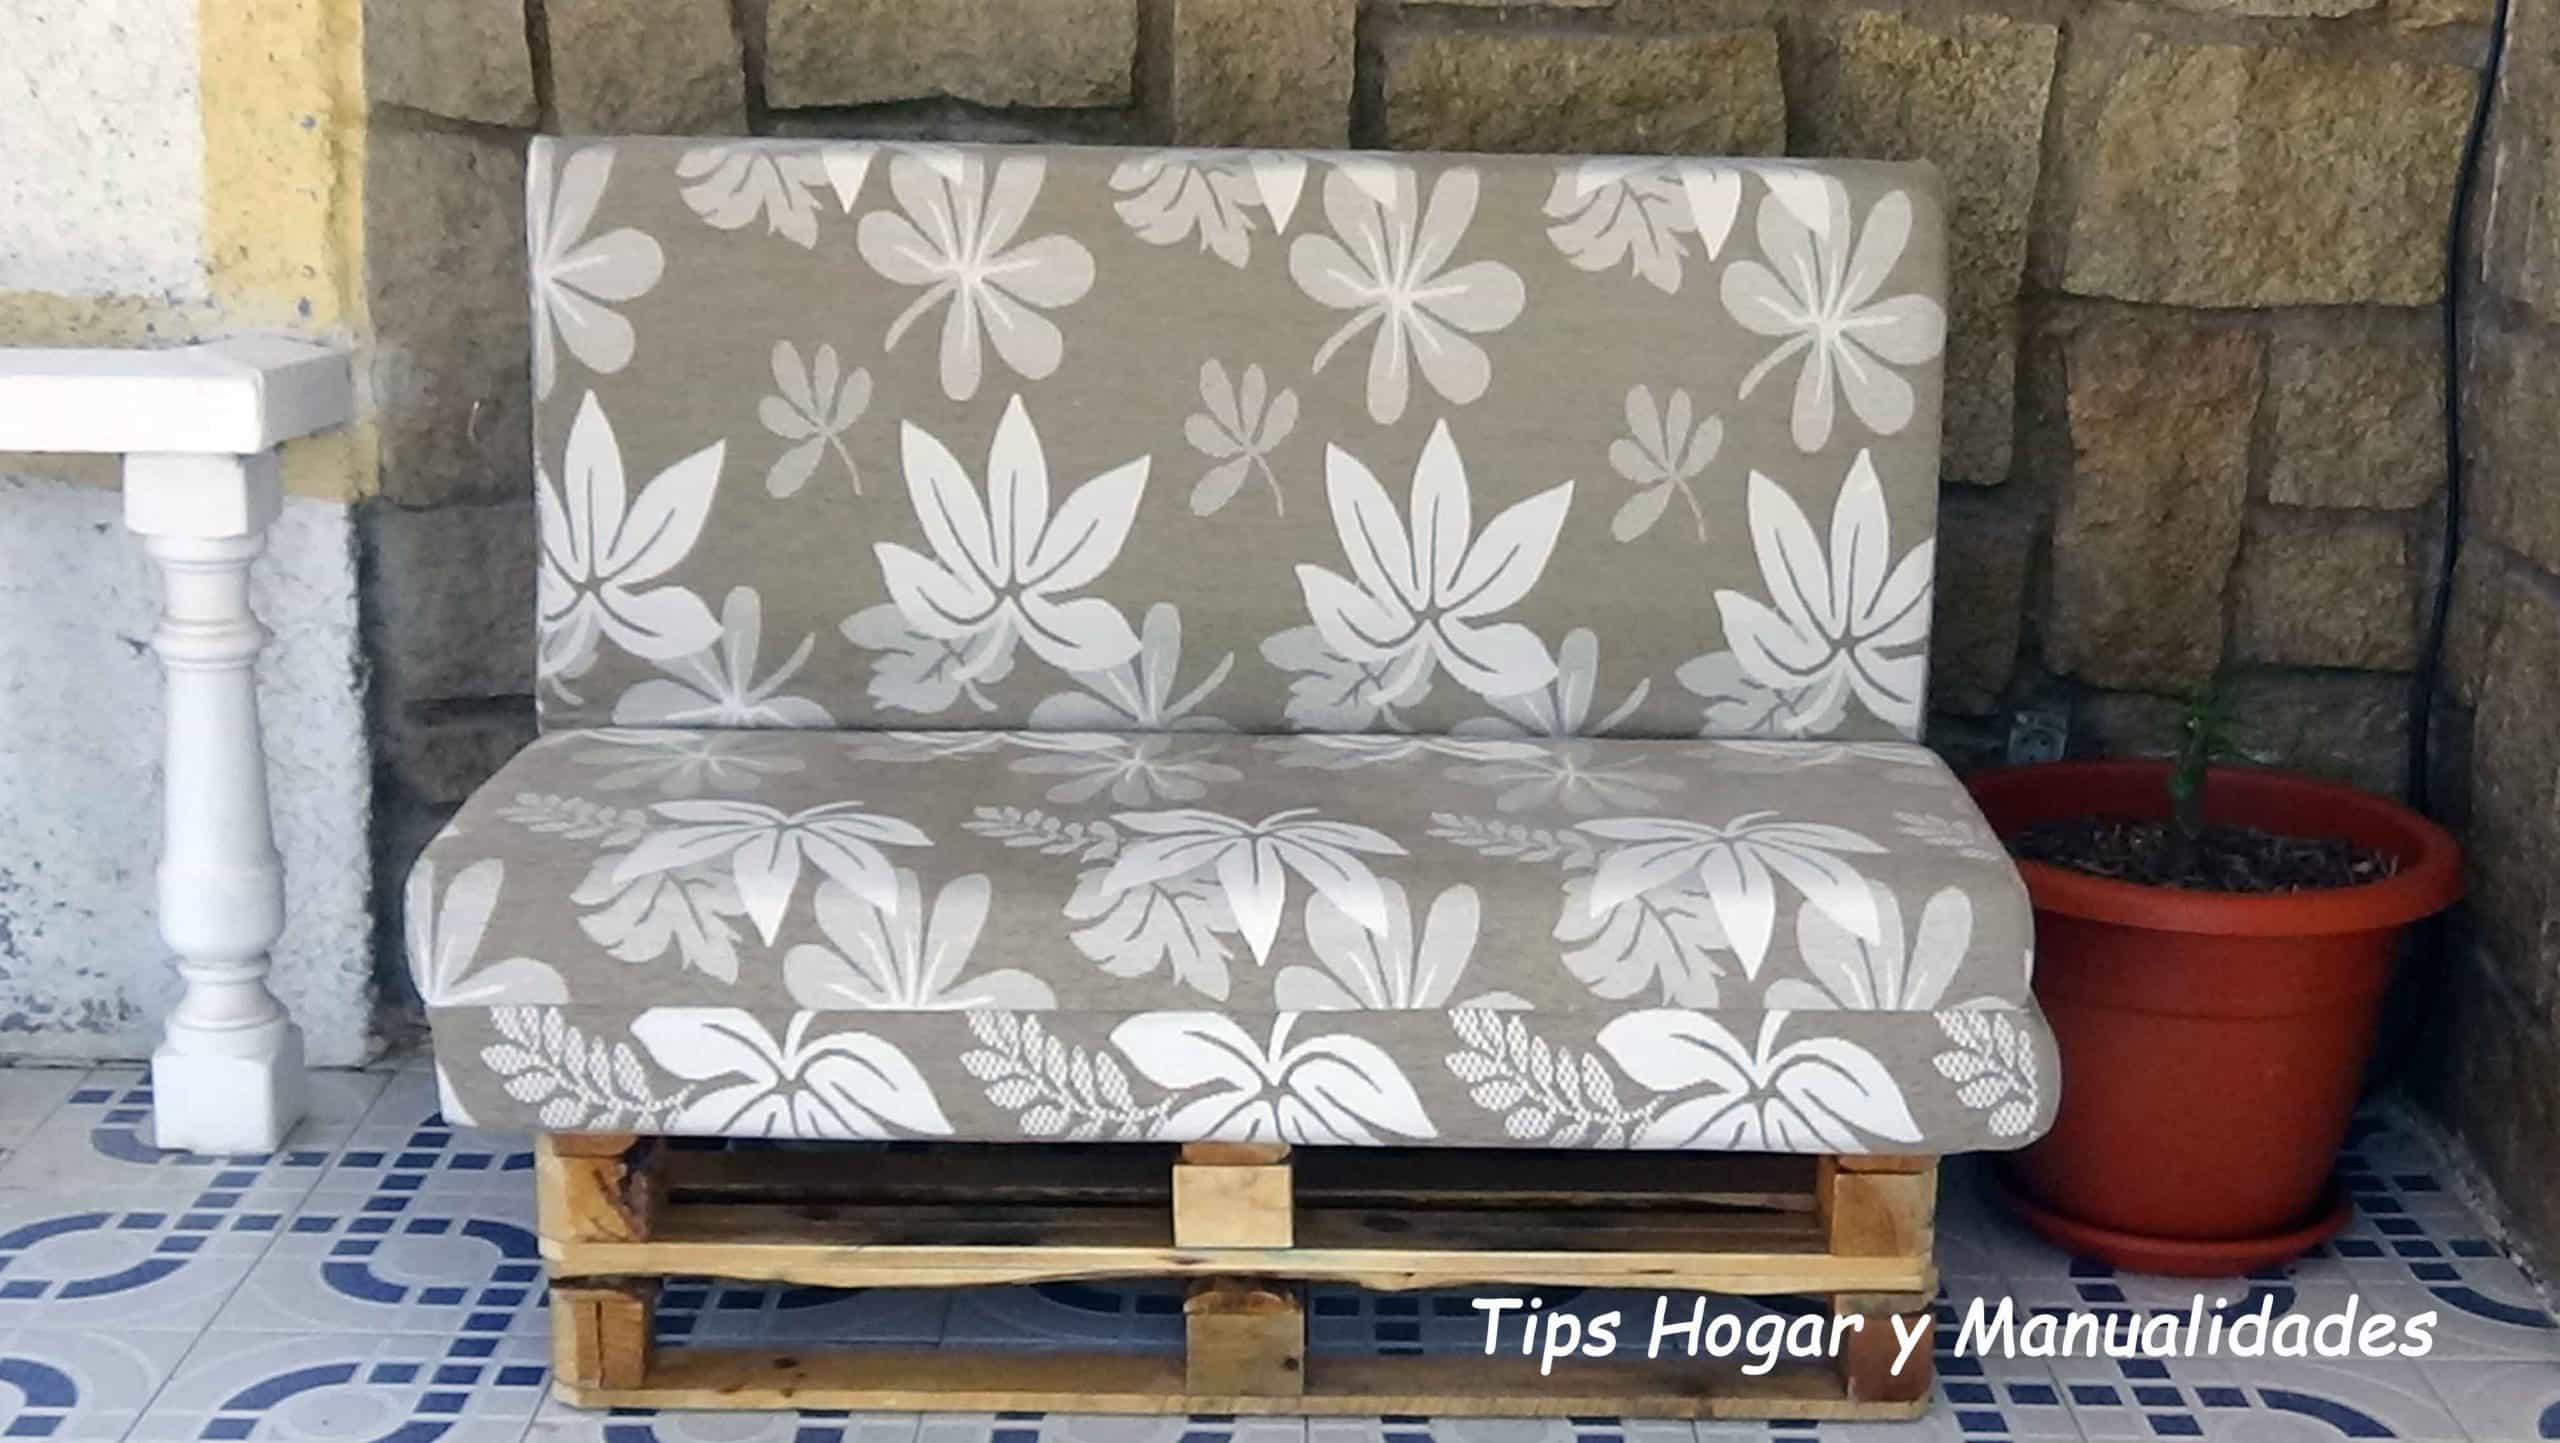 C mo hacer un sof f cil con palets la mansi n de las ideas - Como hacer un sofa con palets ...